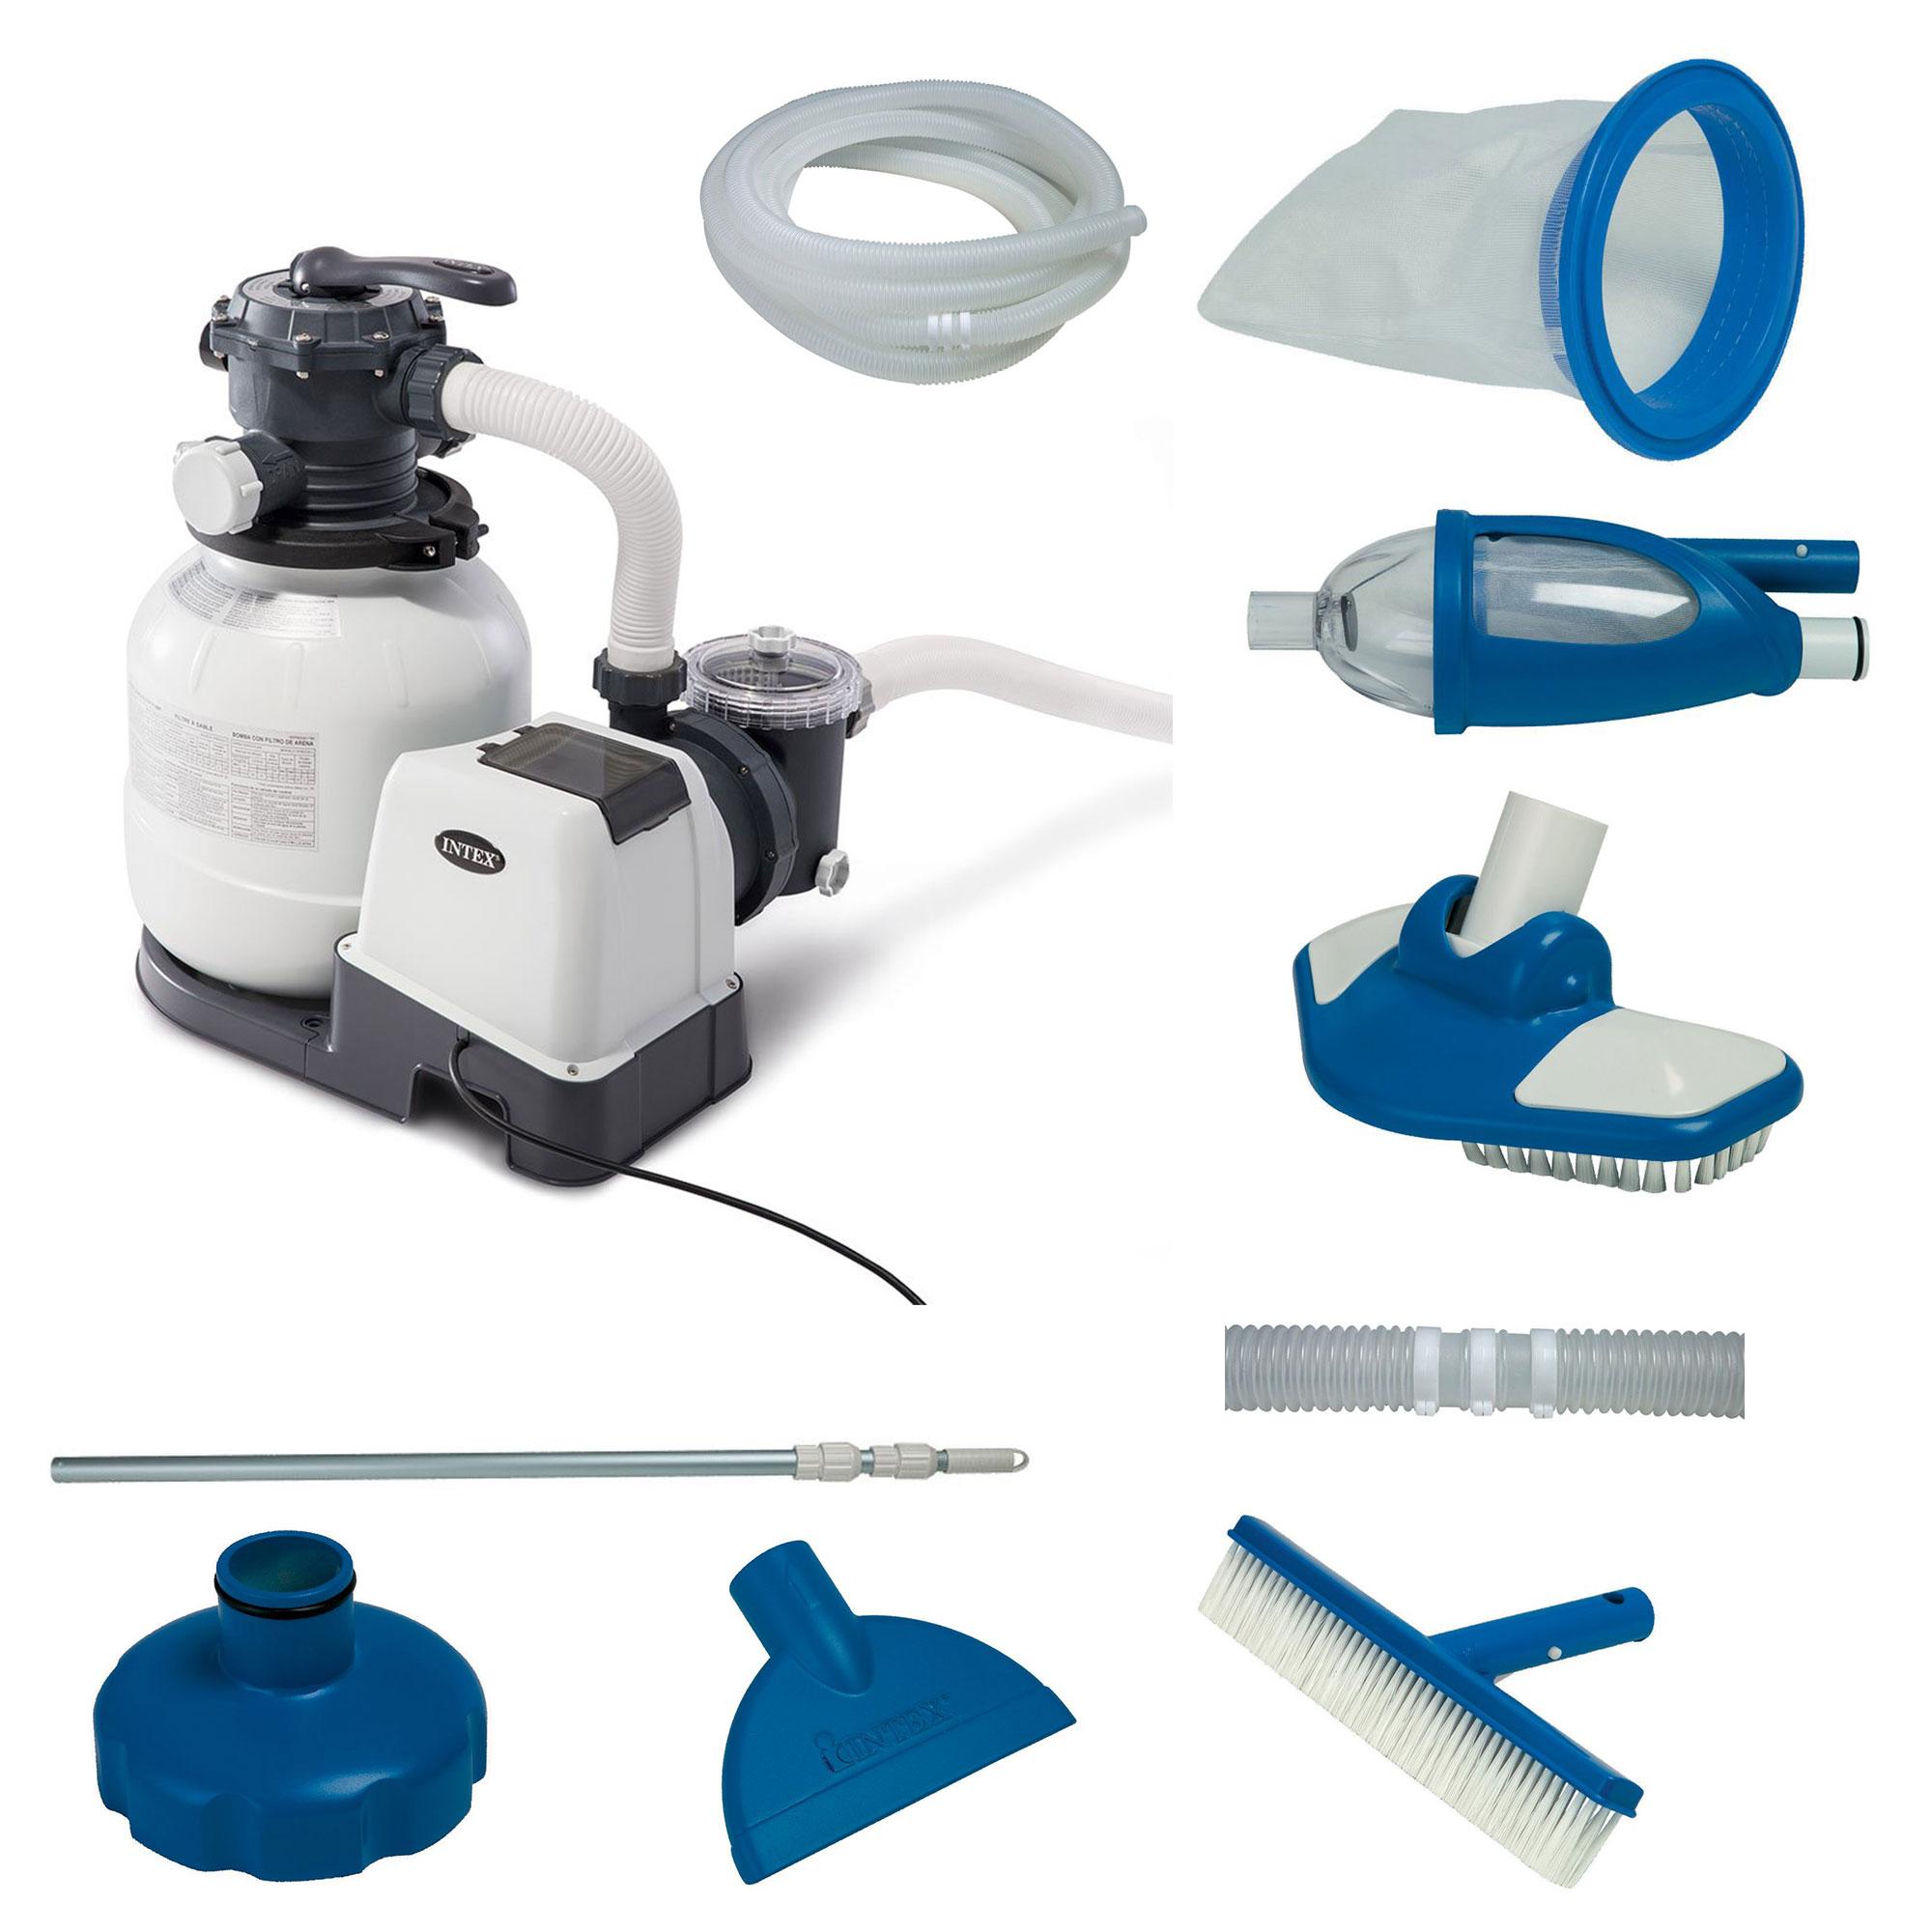 Intex 2100 Gph Above Ground Pool Sand Filter Pump W